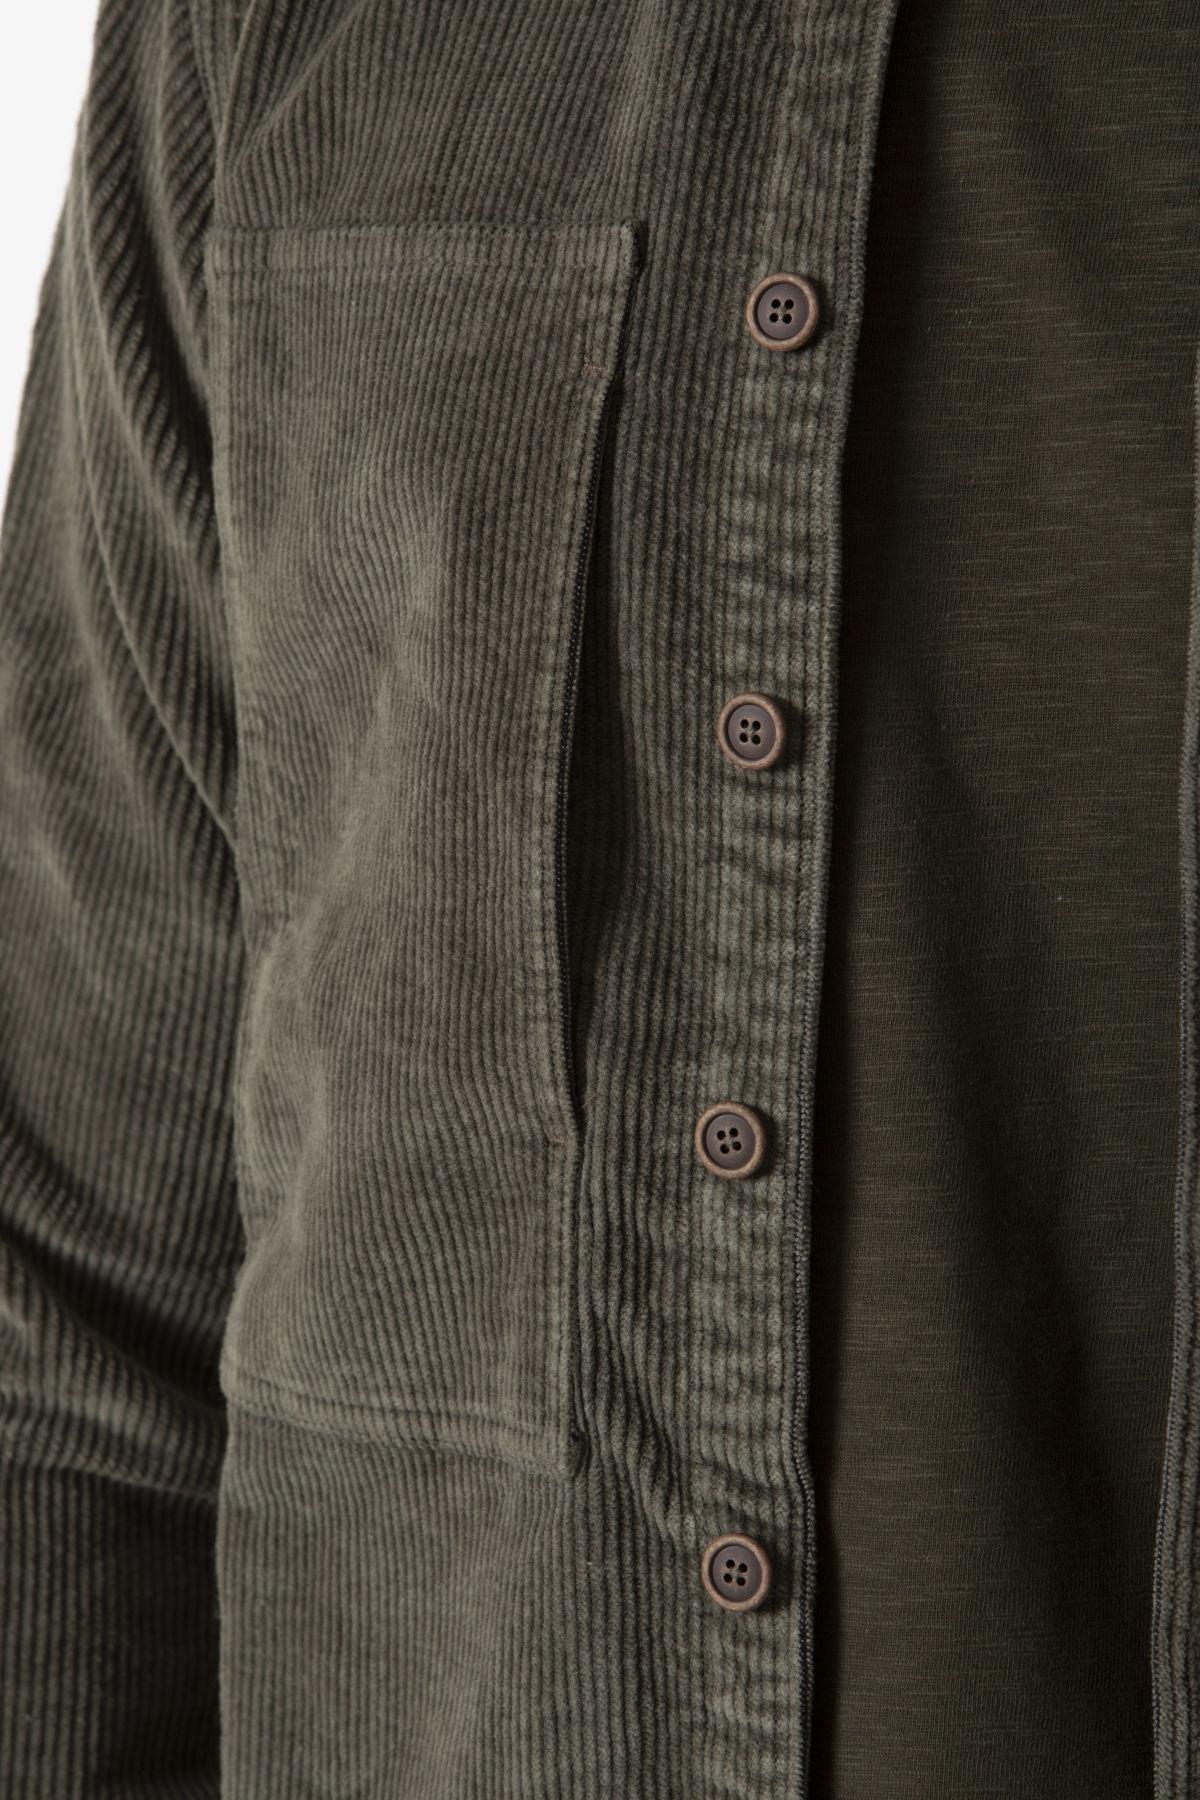 Camicia COLORADO per uomo ZIP CODE 36061 A/I 19-20